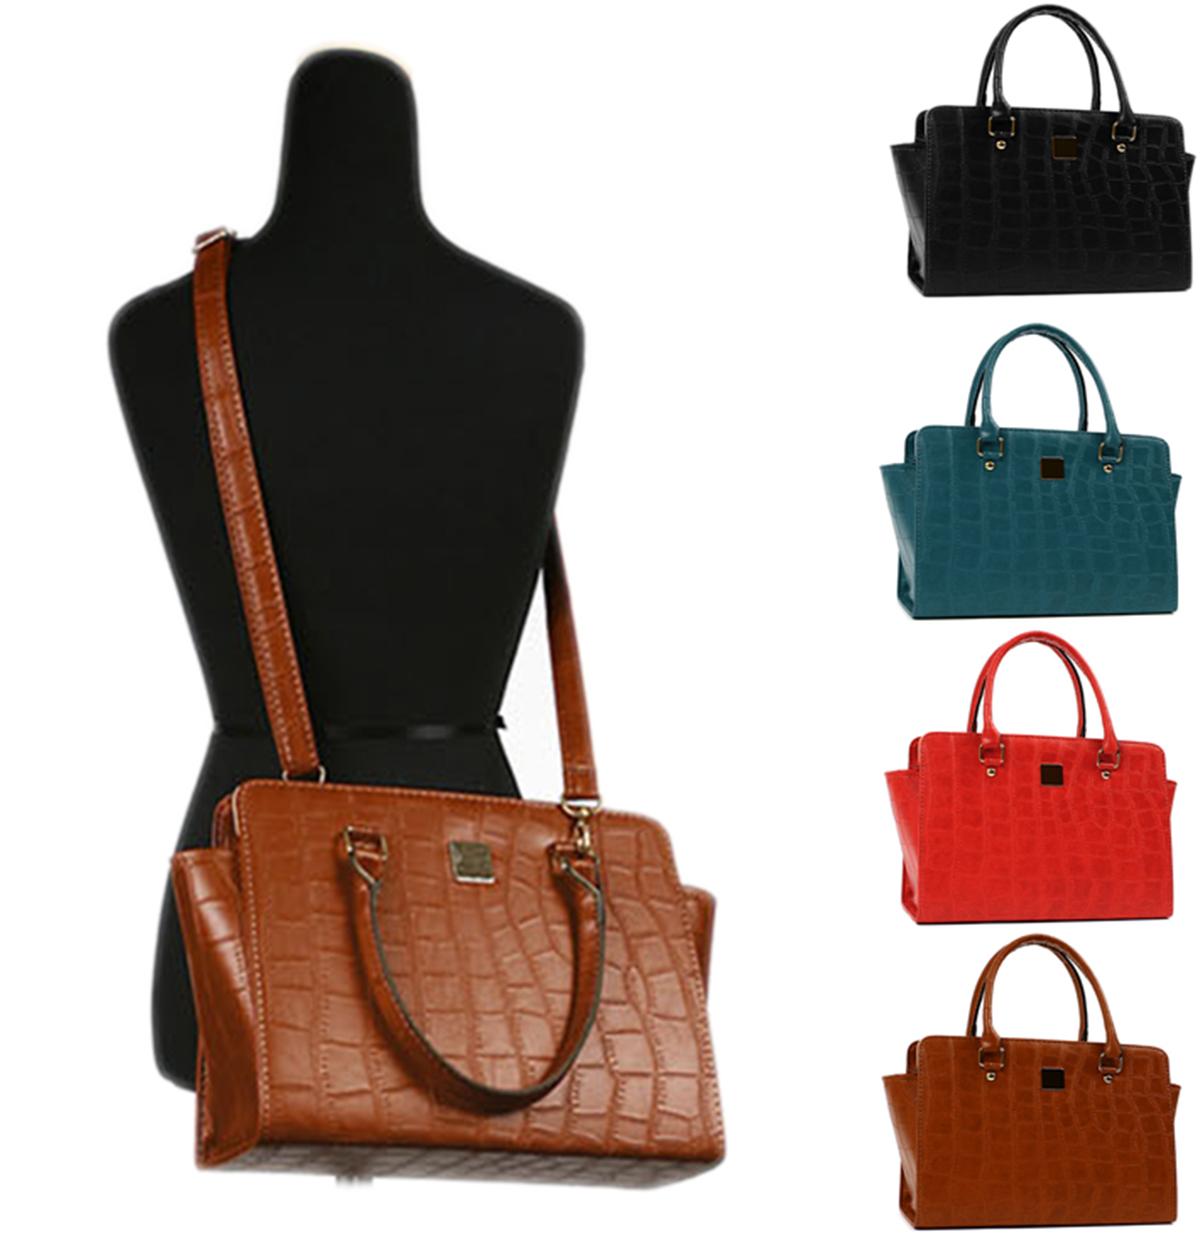 Brend New Womans Basic Shoulder or Tote Bag Snake Skin Type Neutral Style Bag | eBay